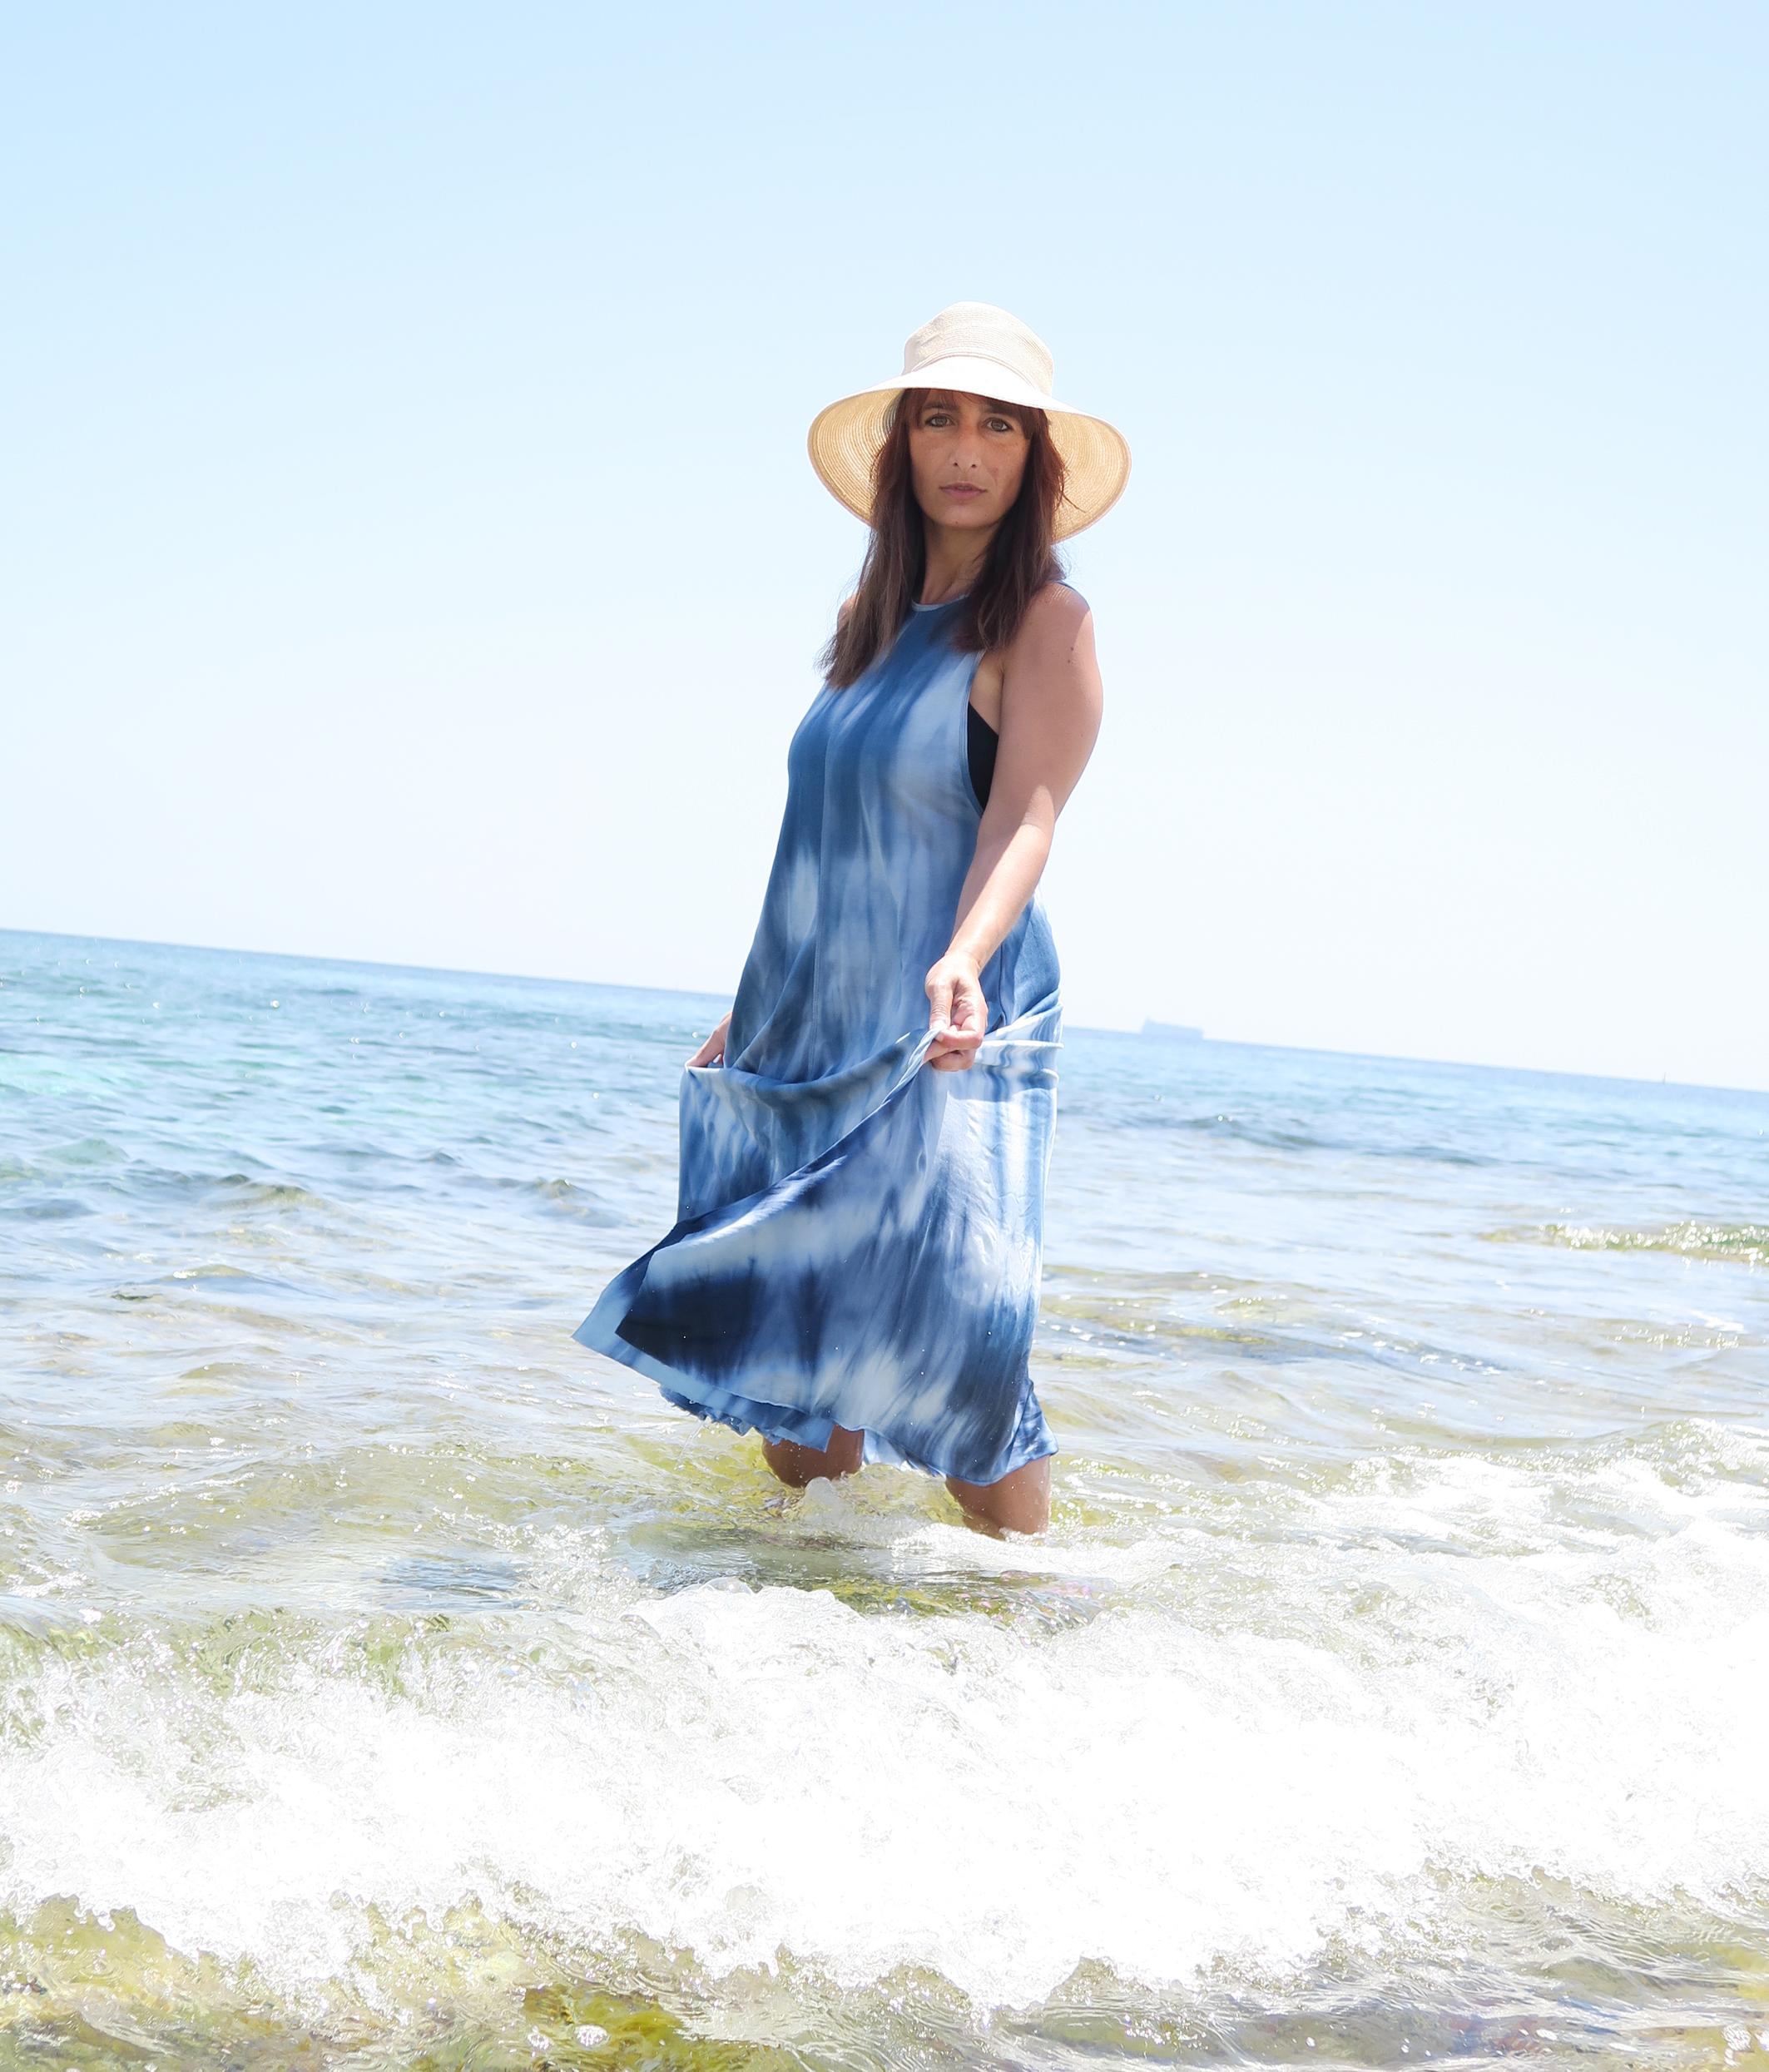 Malta-Blogger-Streetstyle-Fashion-Modeblogger-Fashionblogger-6